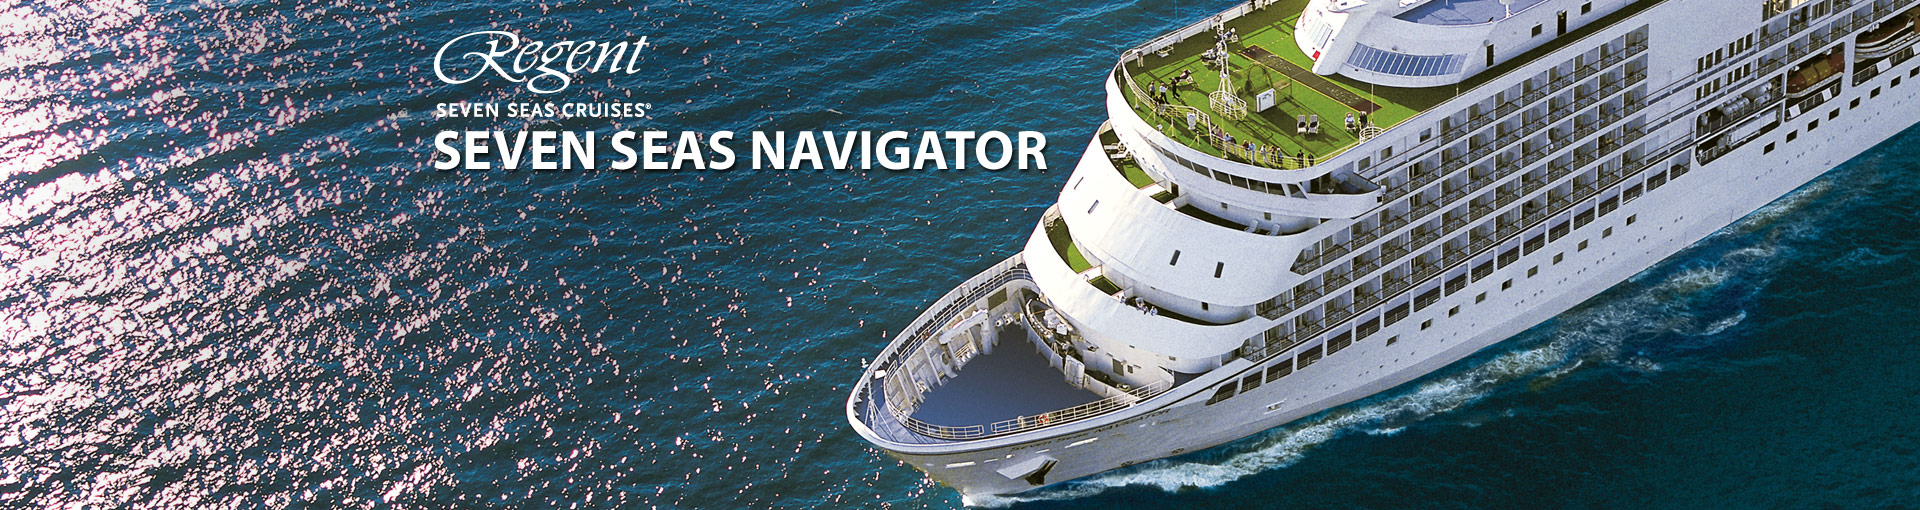 Regent Seven Seas Navigator cruise ship